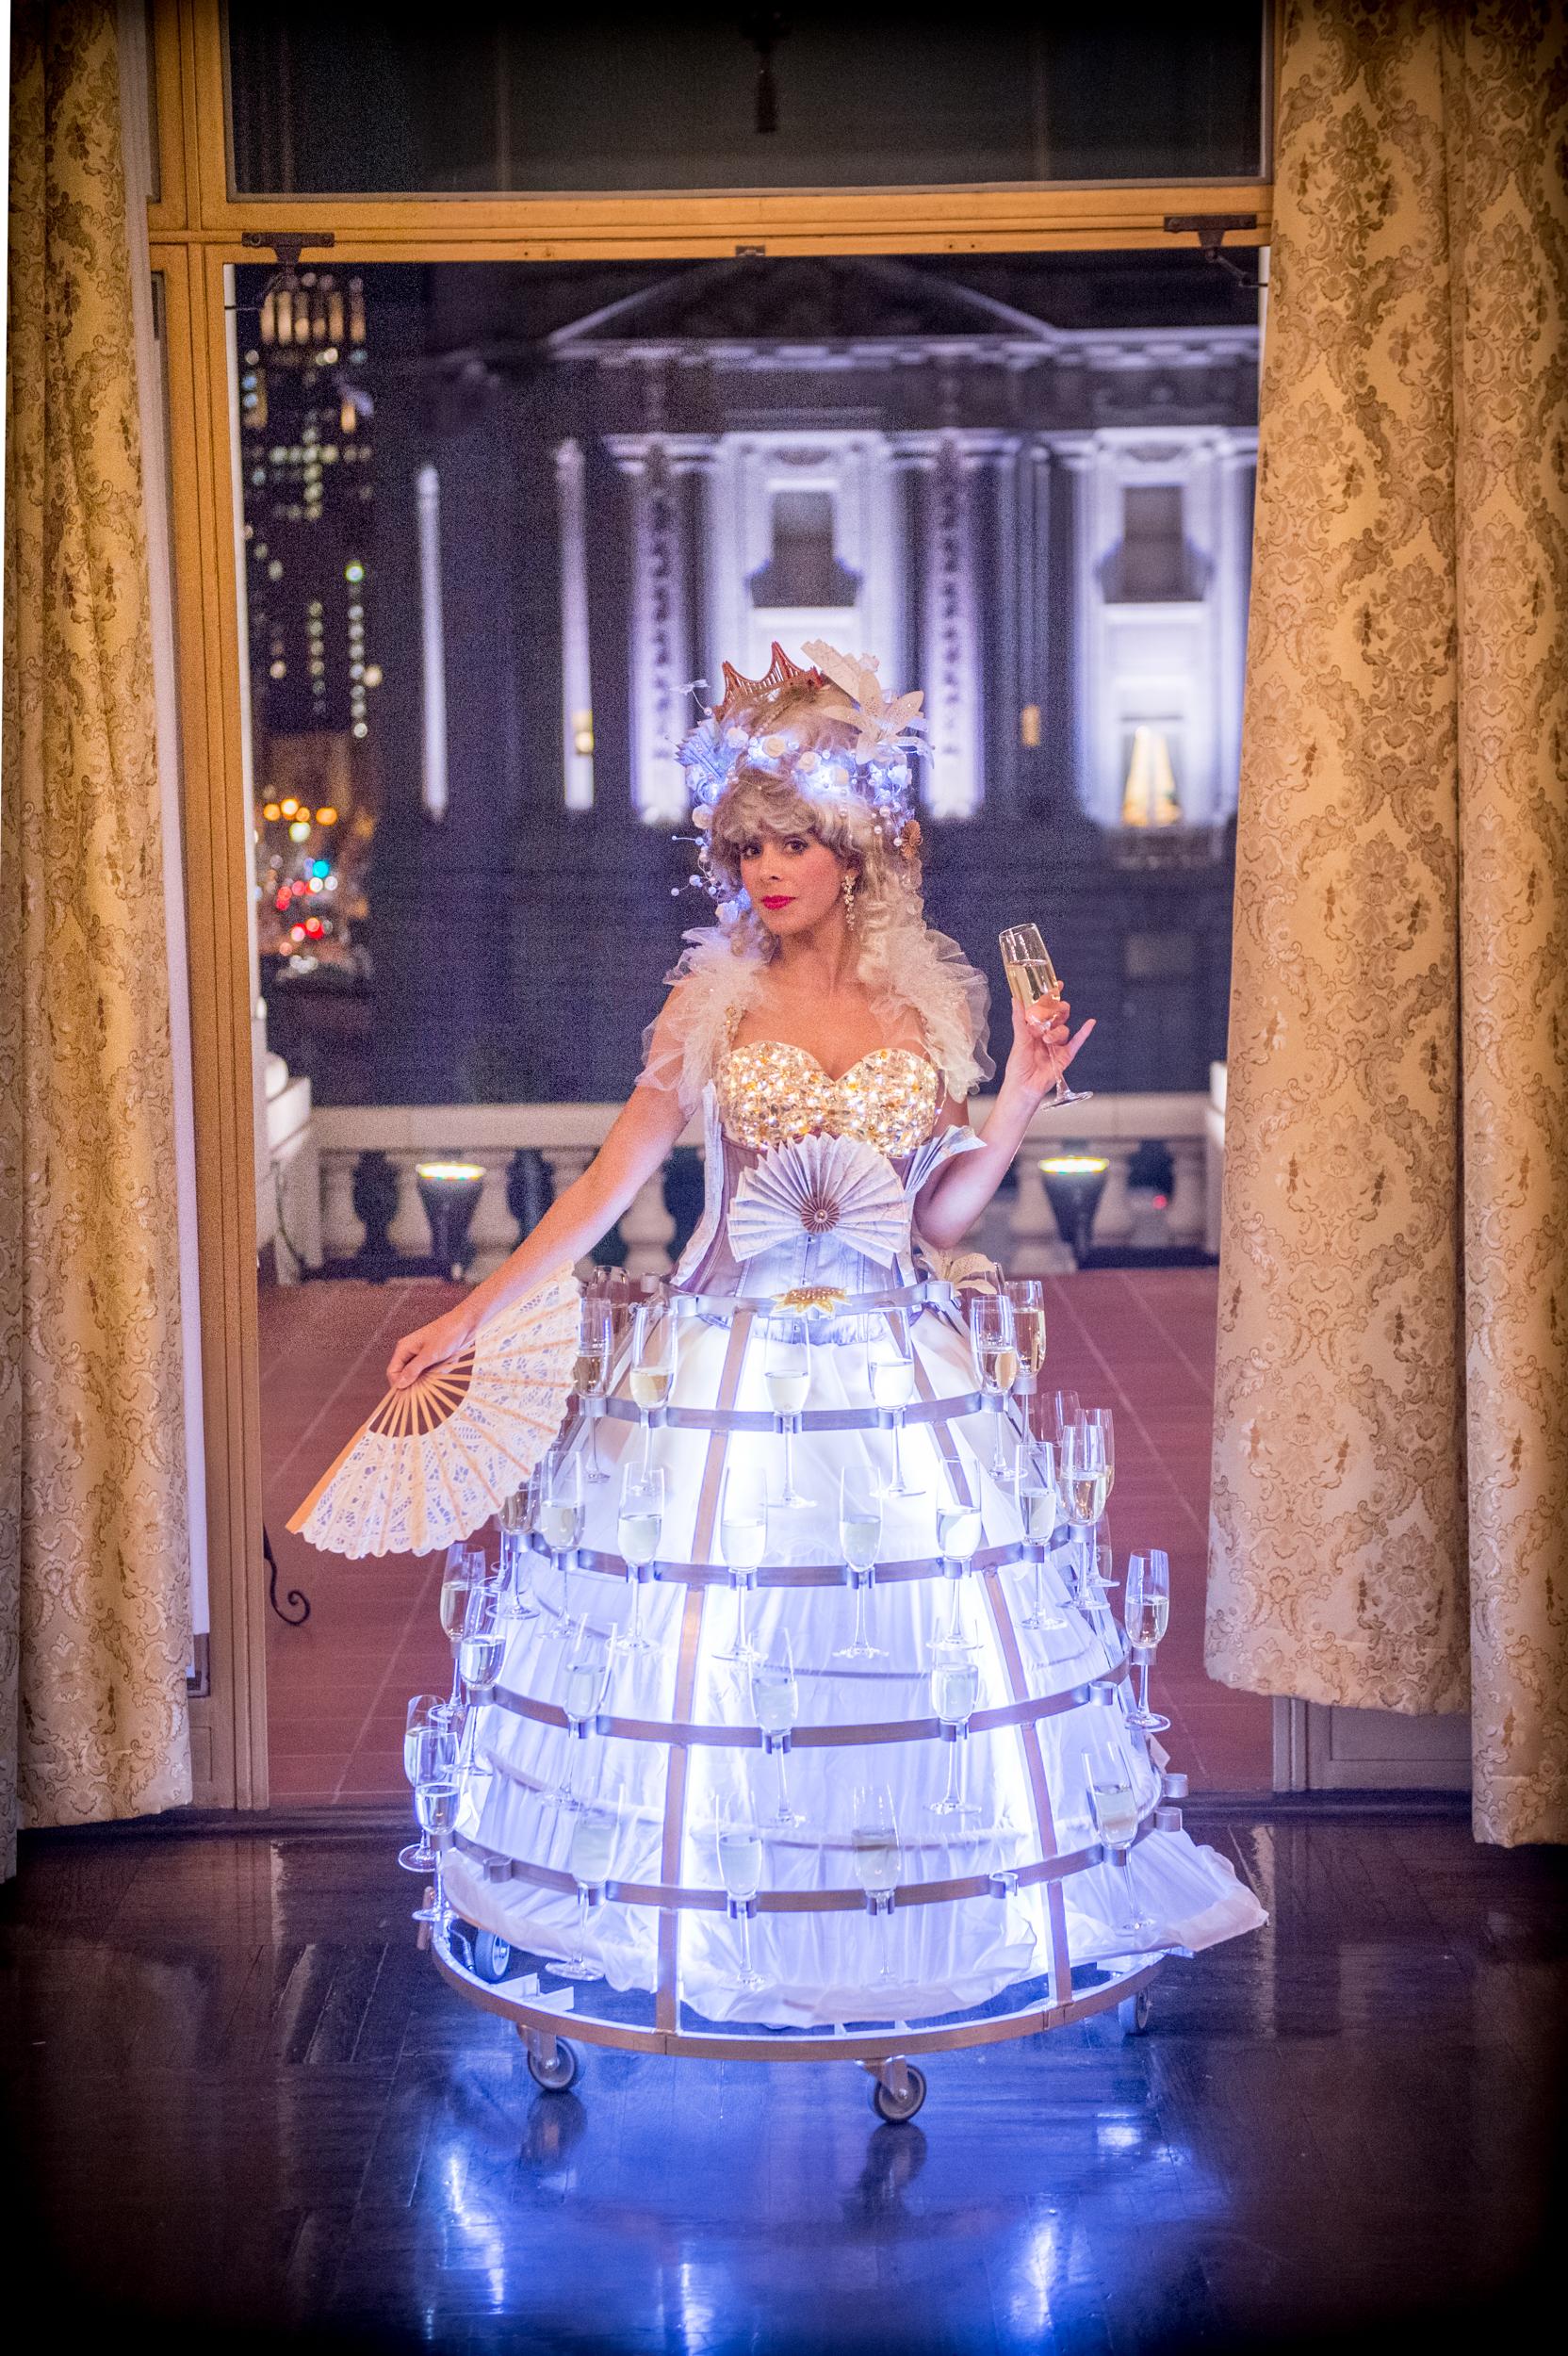 NACE San Francisco Gala 2016: Secrets of the City - Photogenic Events